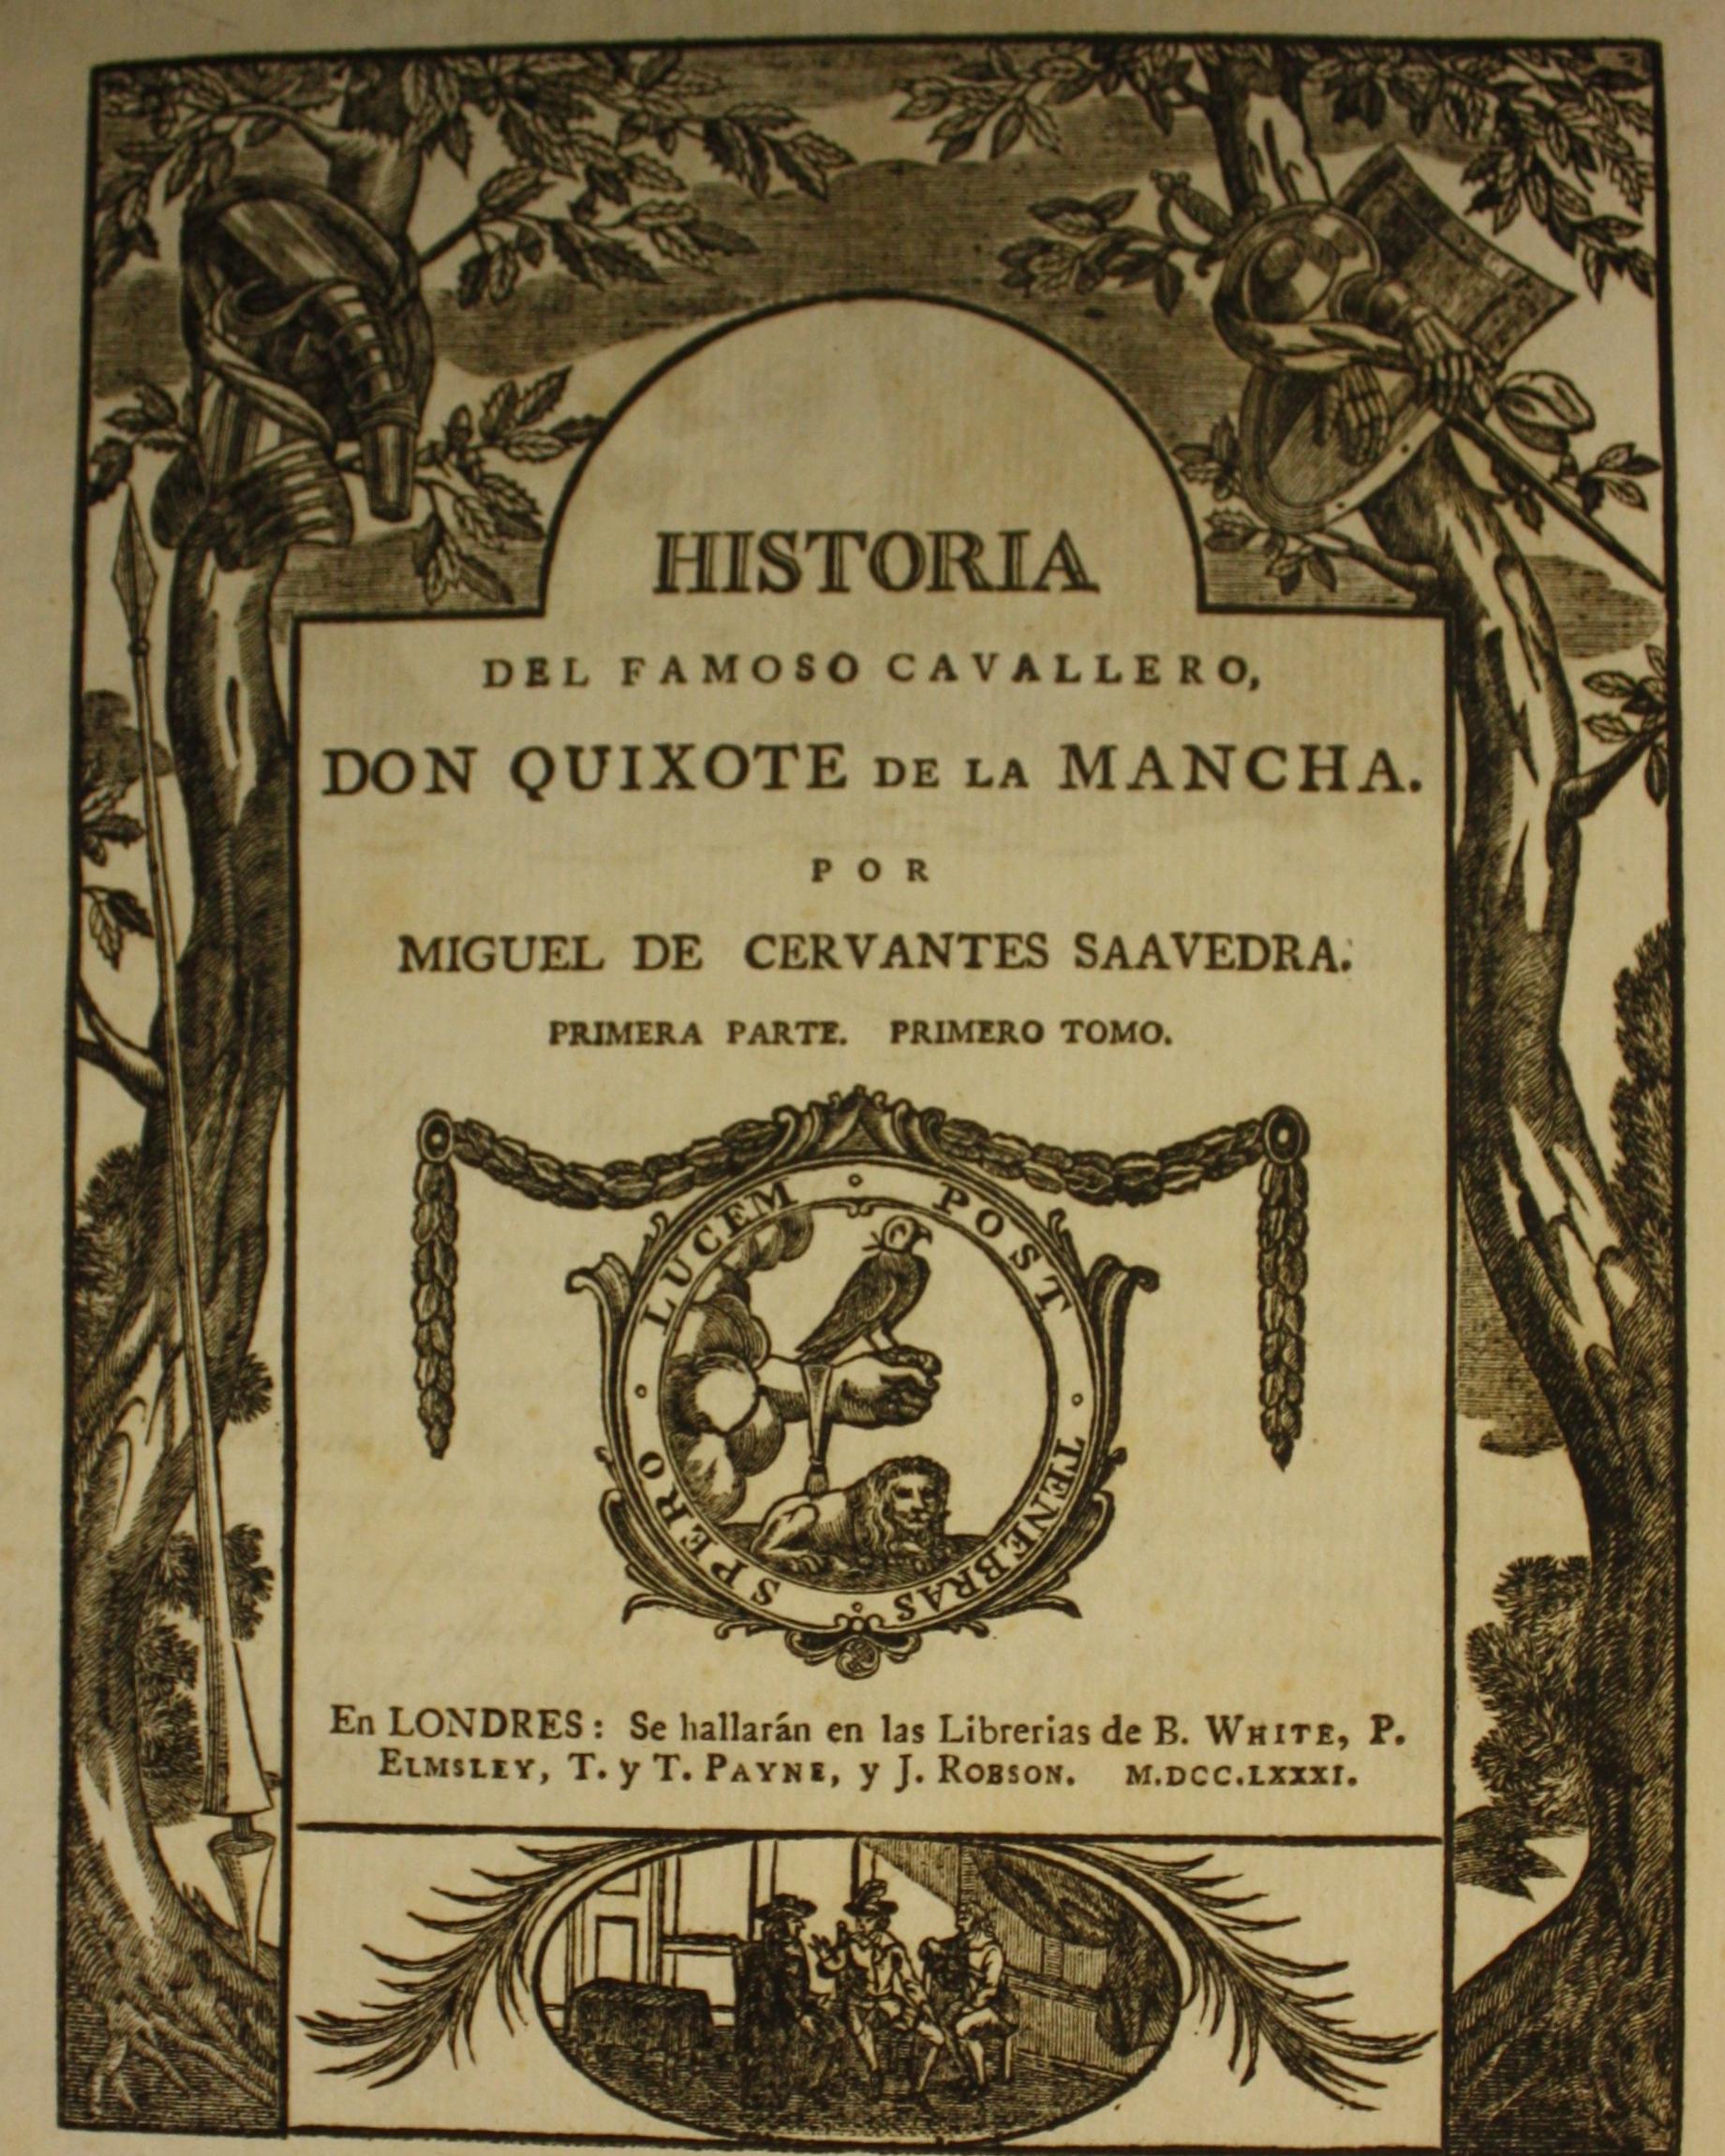 Title page of Don Quixote Part 1